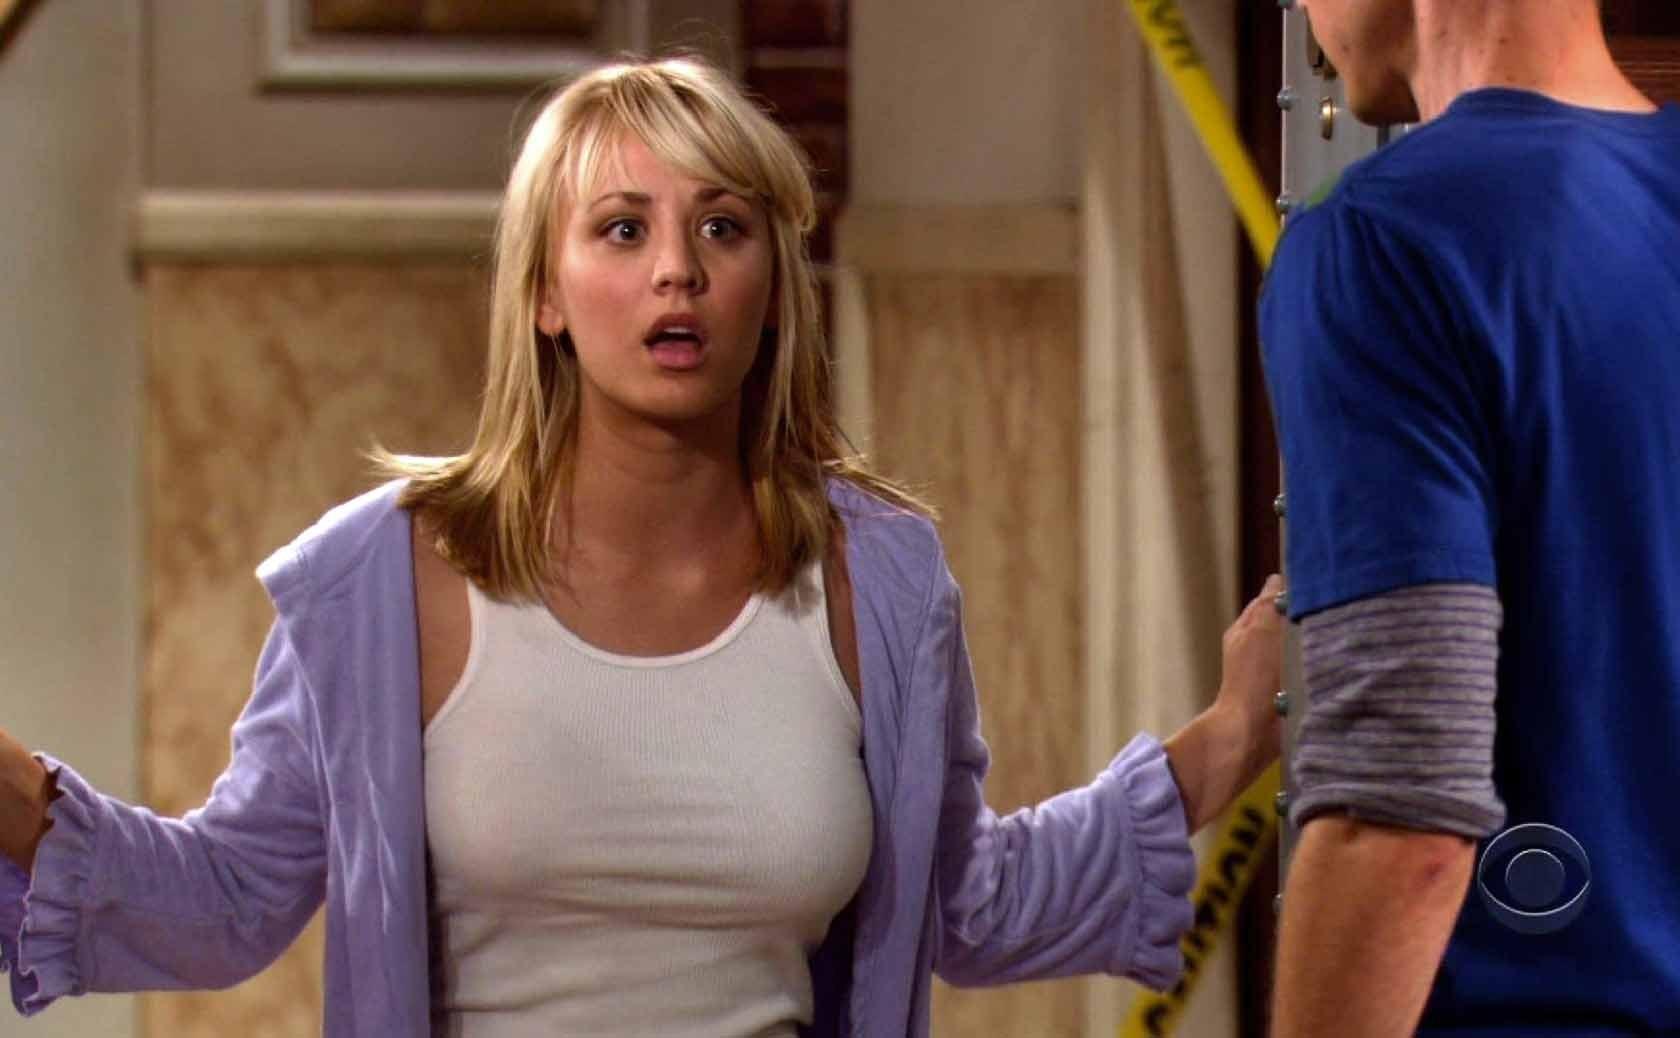 Mensaje de despedida de actores de The Big bang Theory